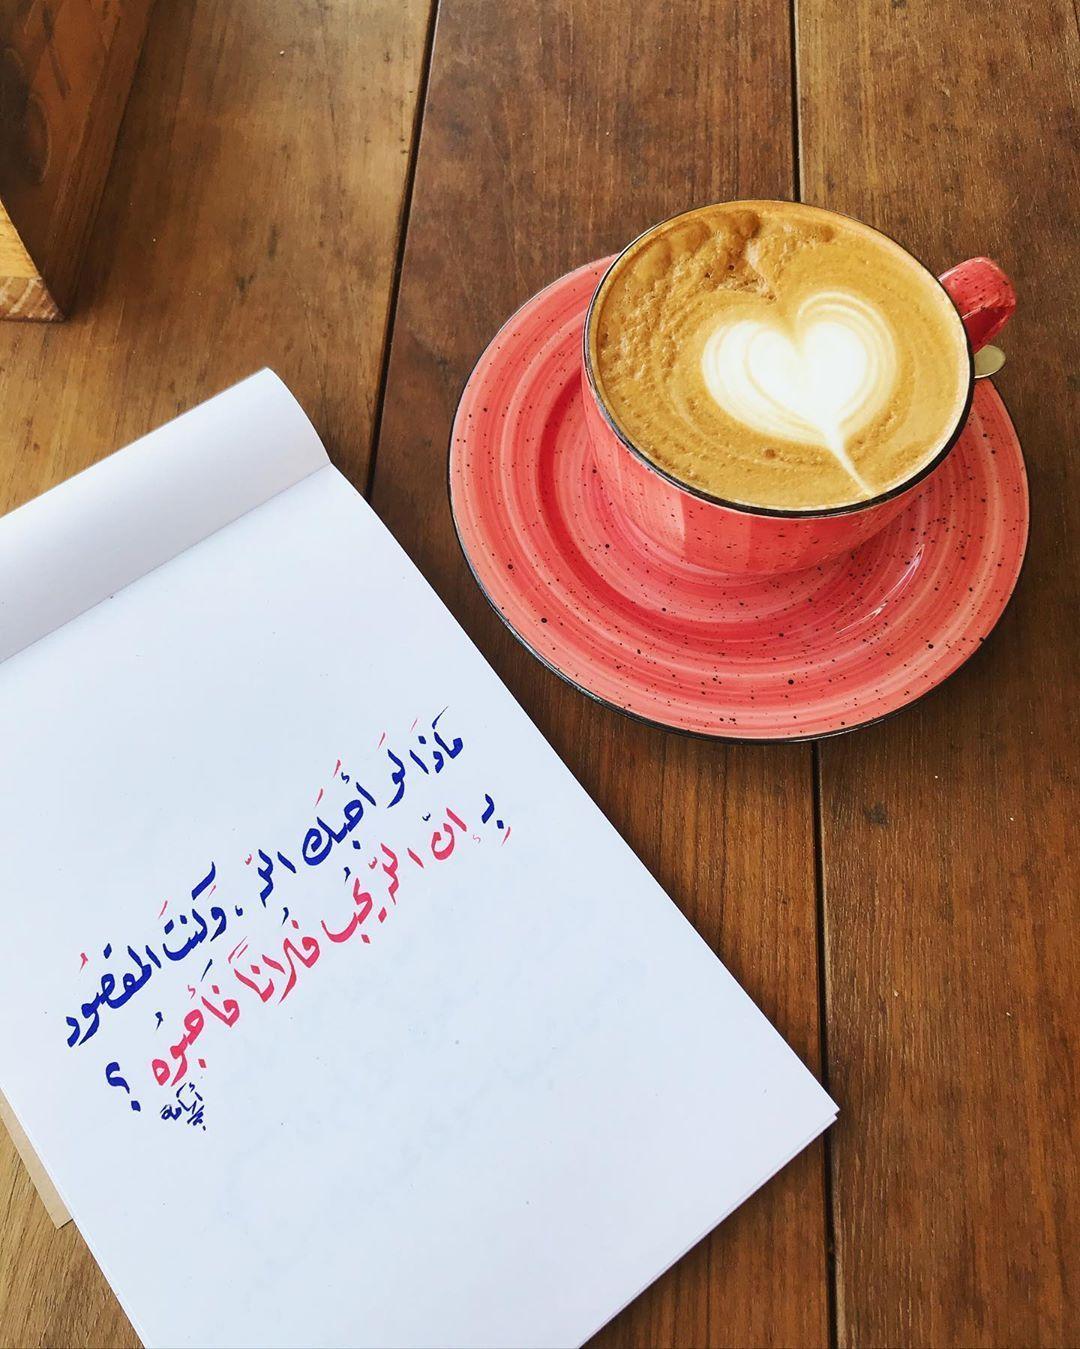 Osama M Atallah لعلك أنت الخير الذي لا يستحقونه صباح الخير Picture Quotes Arabic Quotes Arabic Calligraphy Art